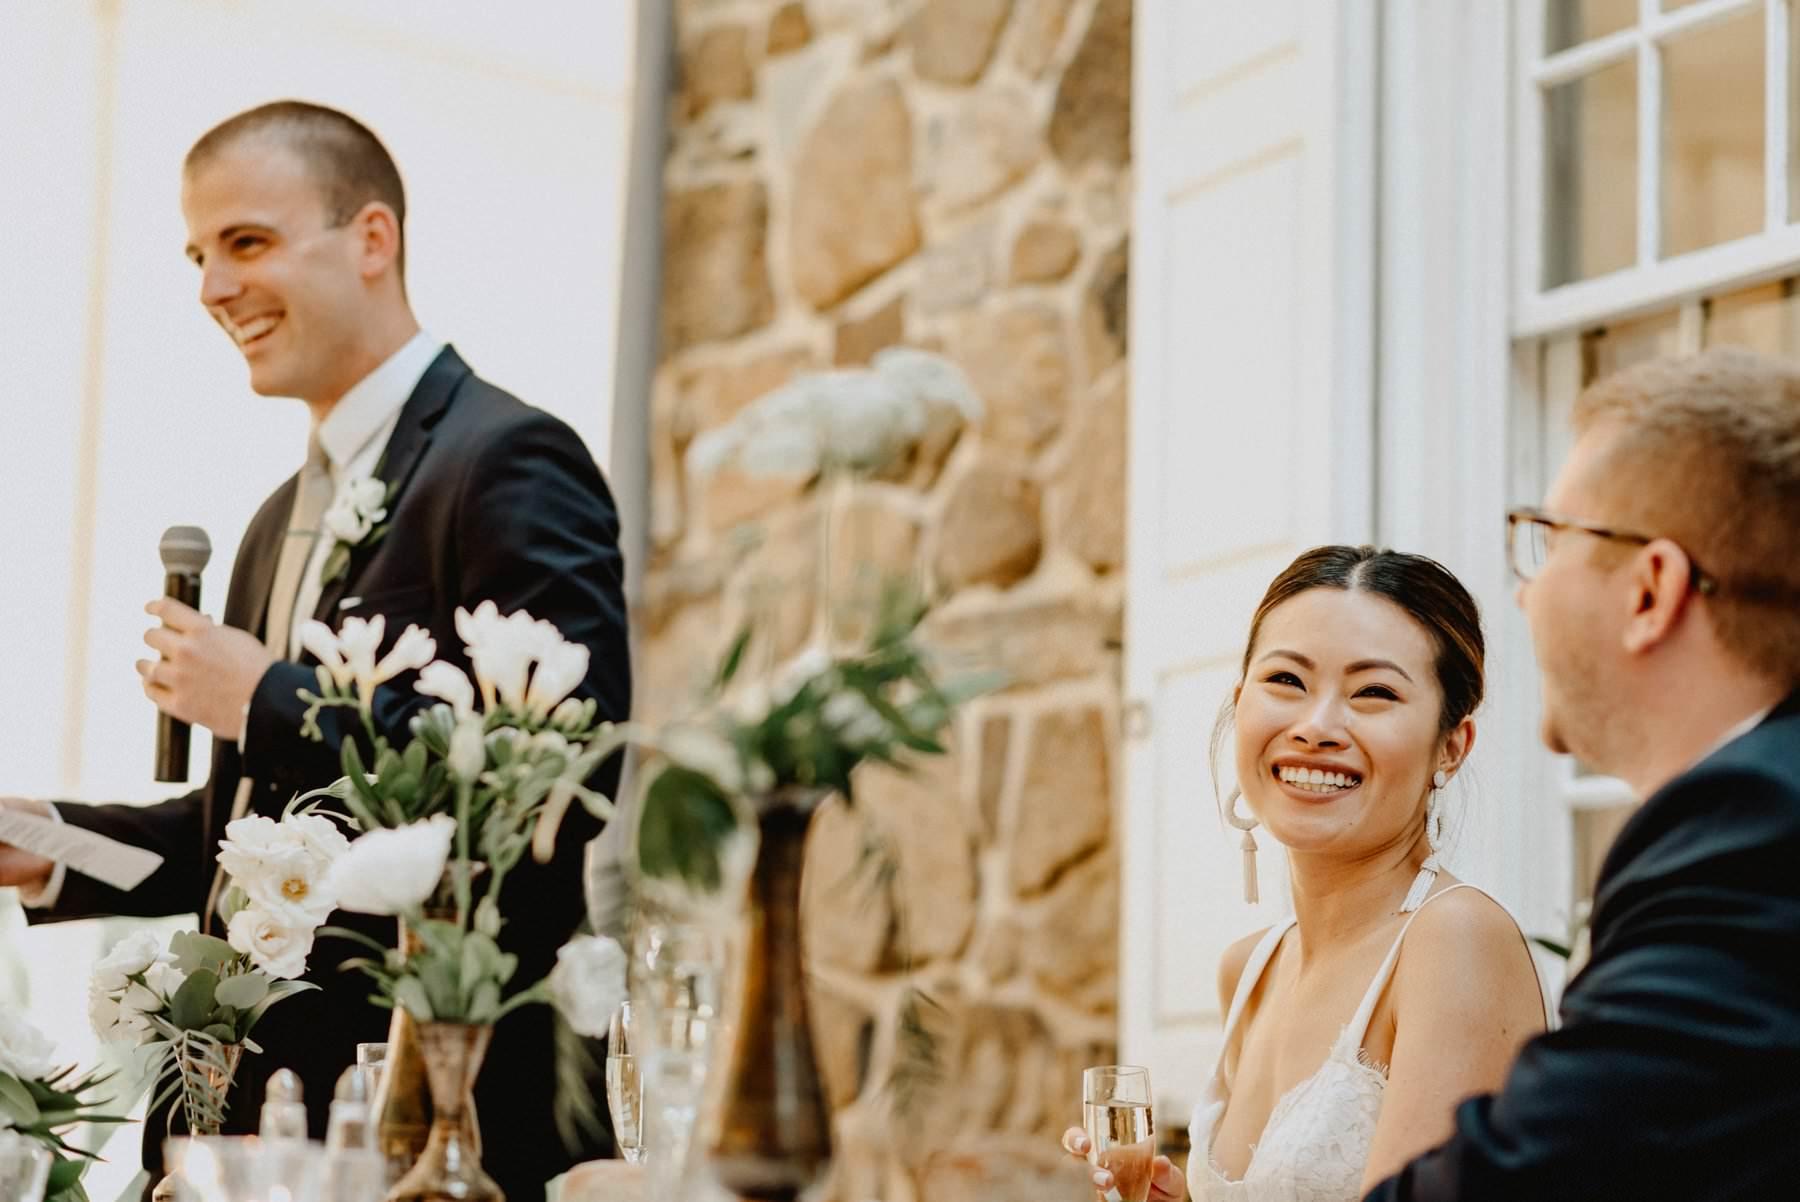 Appleford-estate-wedding-125.jpg